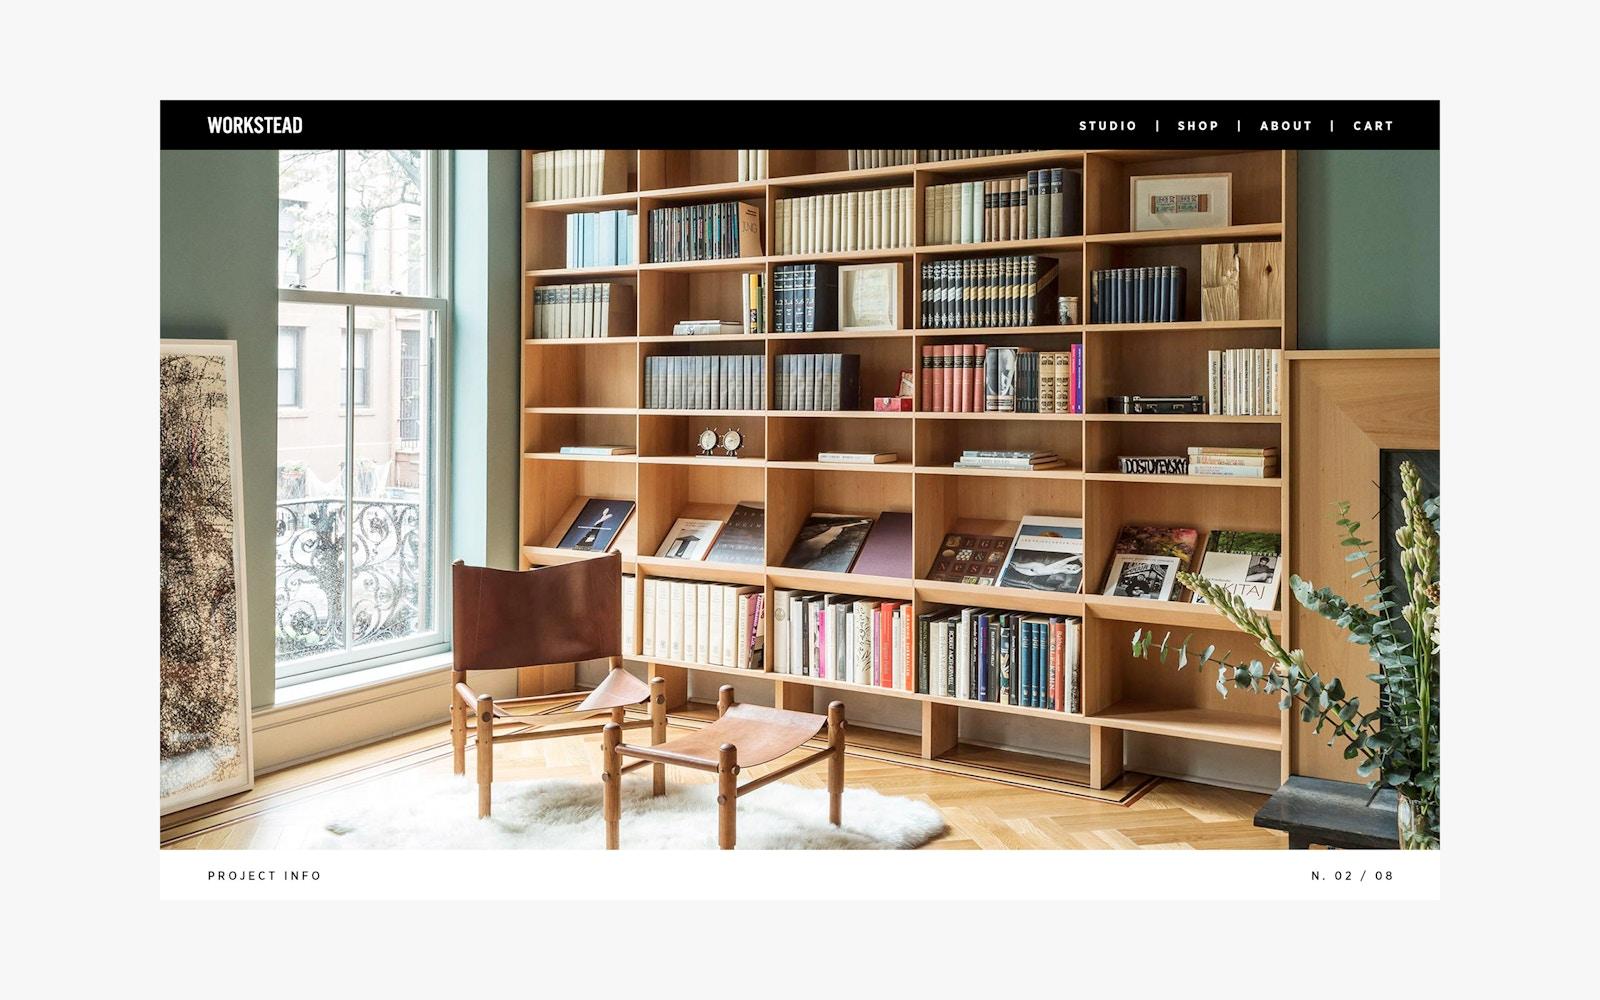 Web Design for Workstead Interior Design Firm